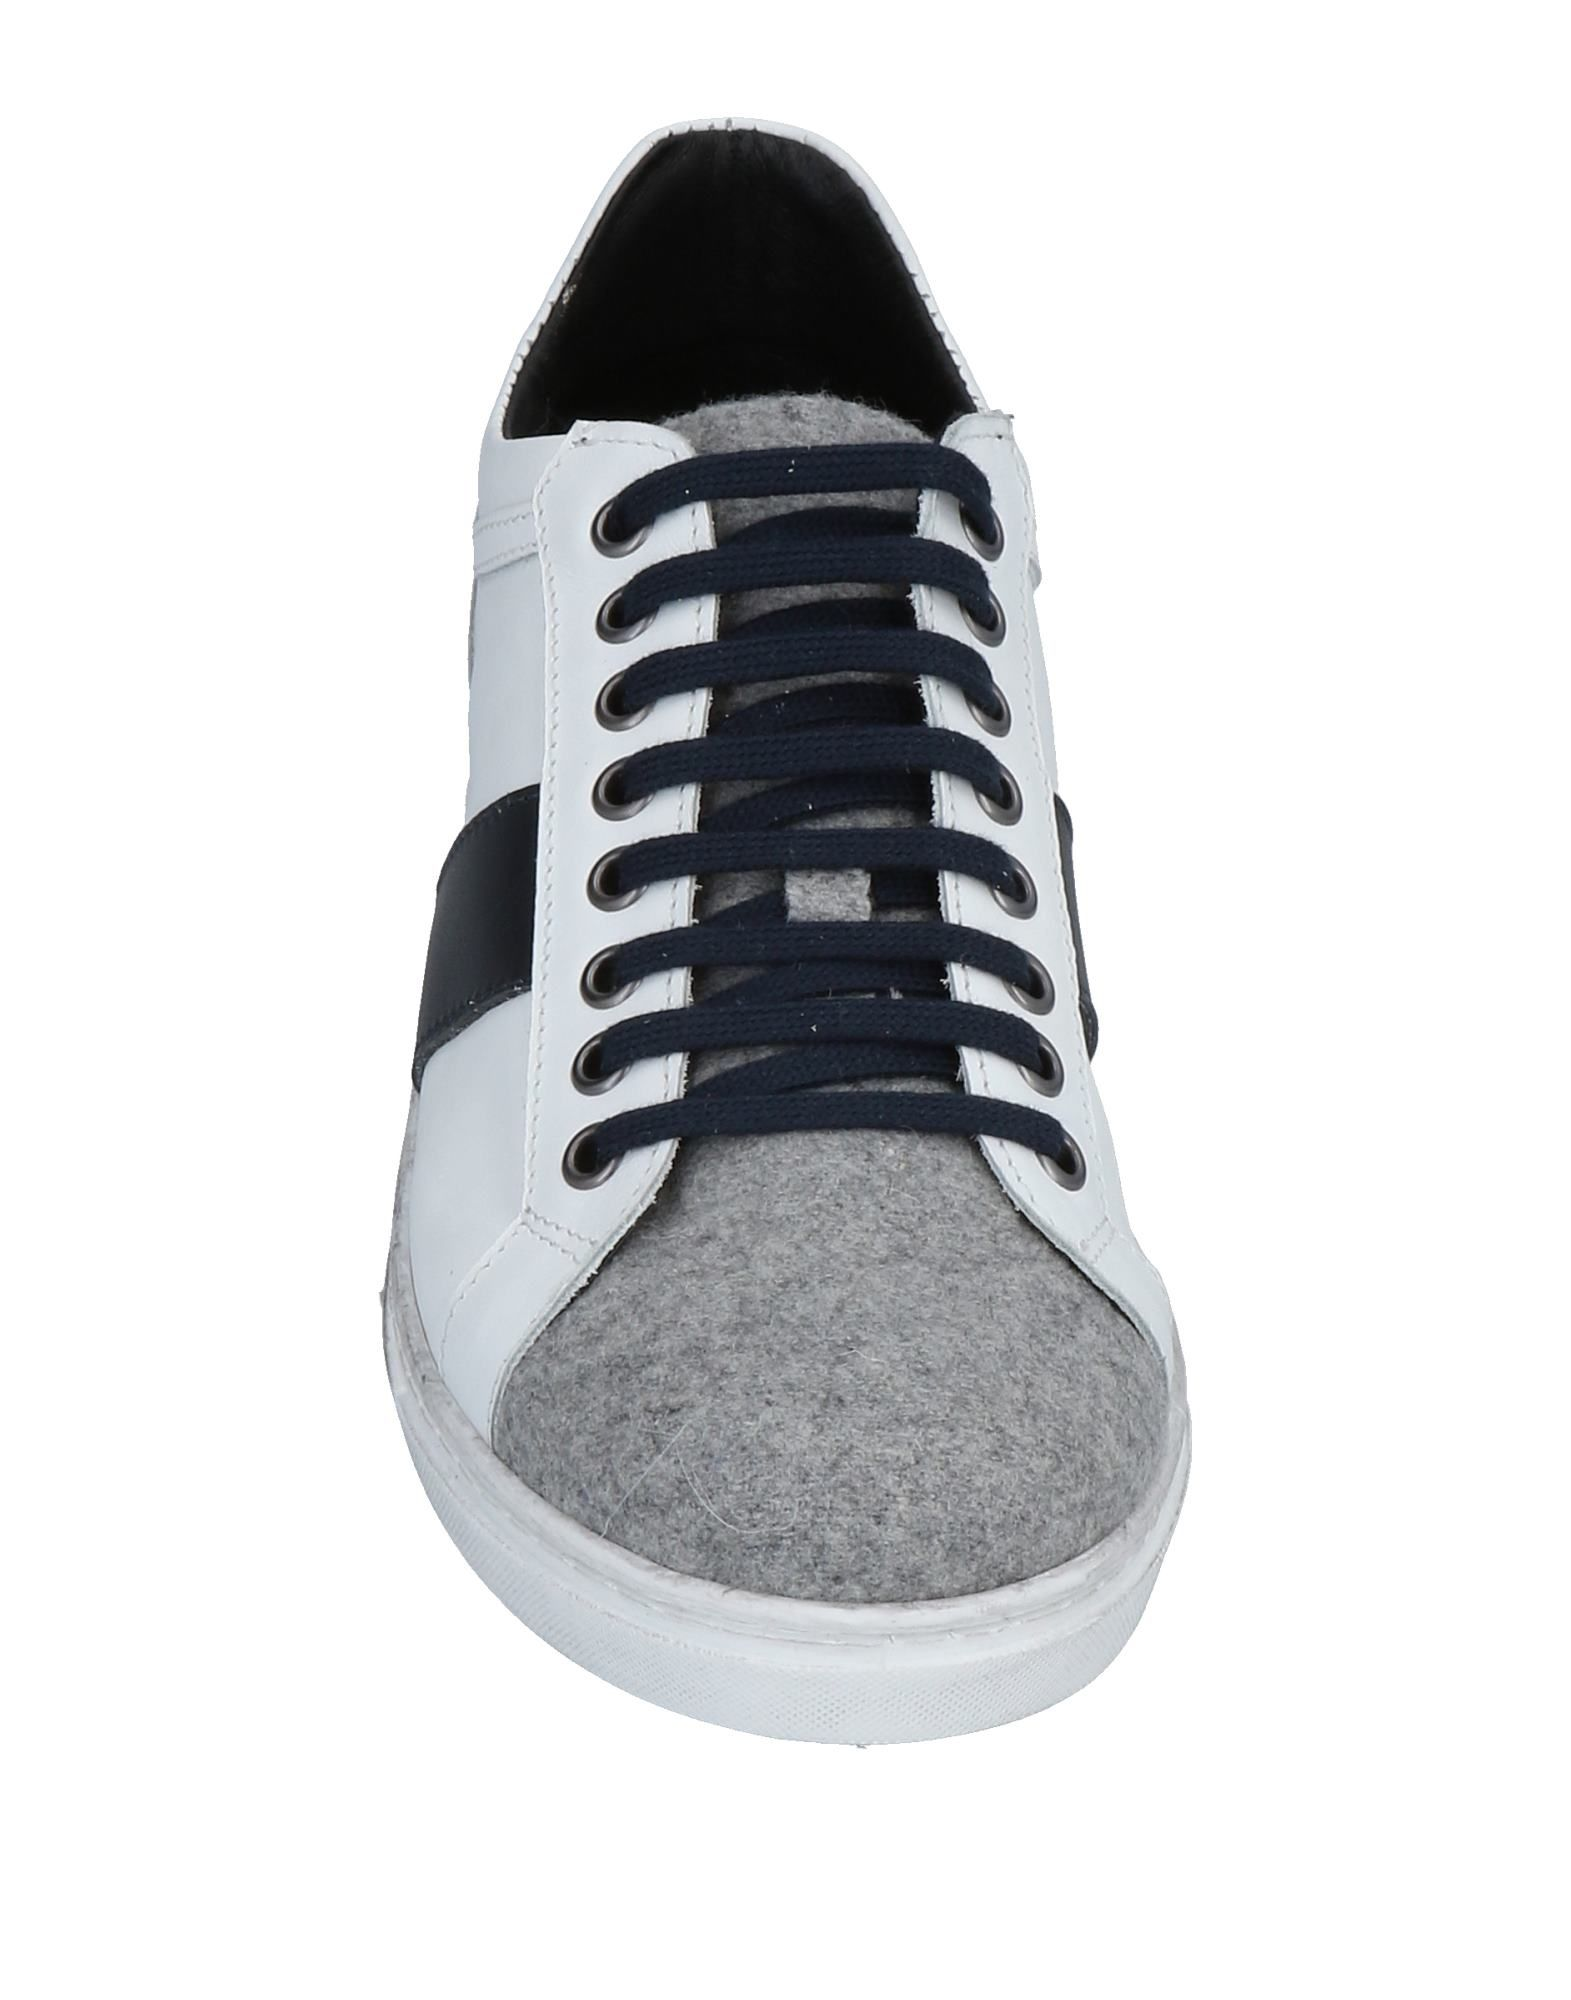 Paolo Pecora Gute Sneakers Damen  11490711PI Gute Pecora Qualität beliebte Schuhe e3c0a4